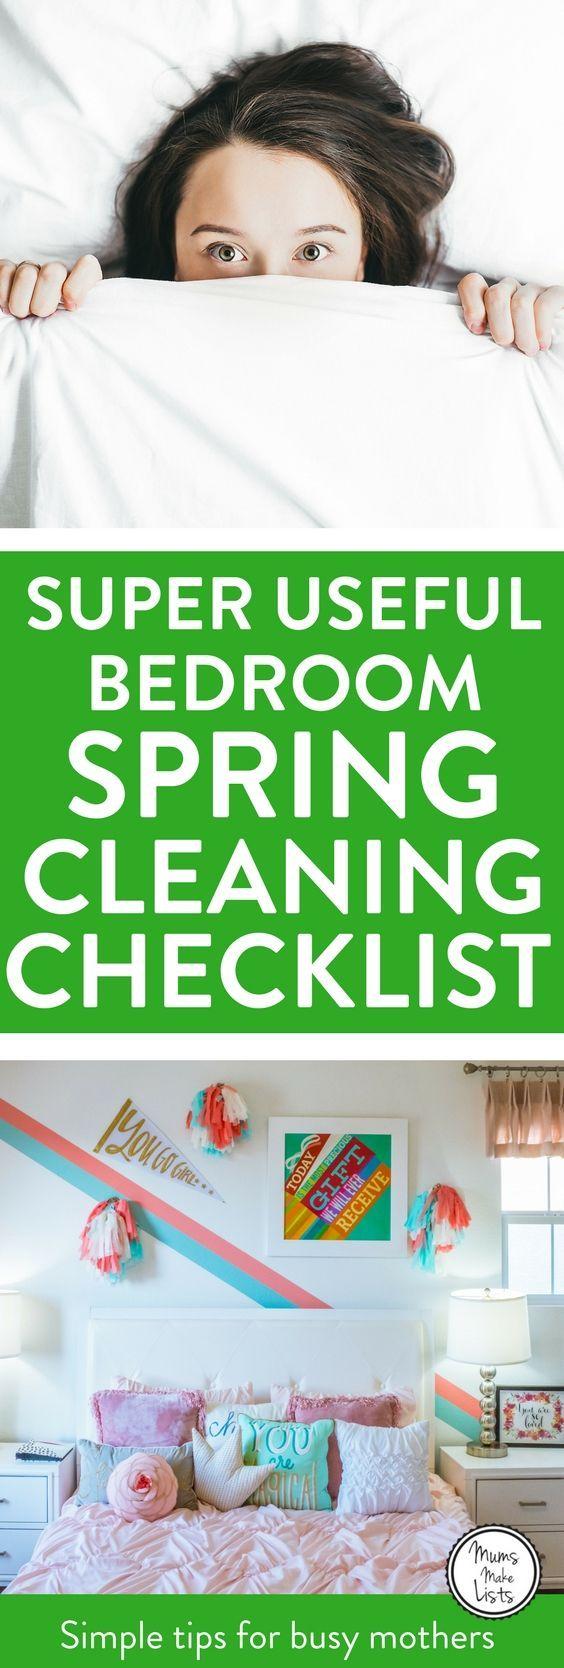 Best 25 Deep Cleaning Checklist Ideas On Pinterest Deep Cleaning Schedule Deep Cleaning